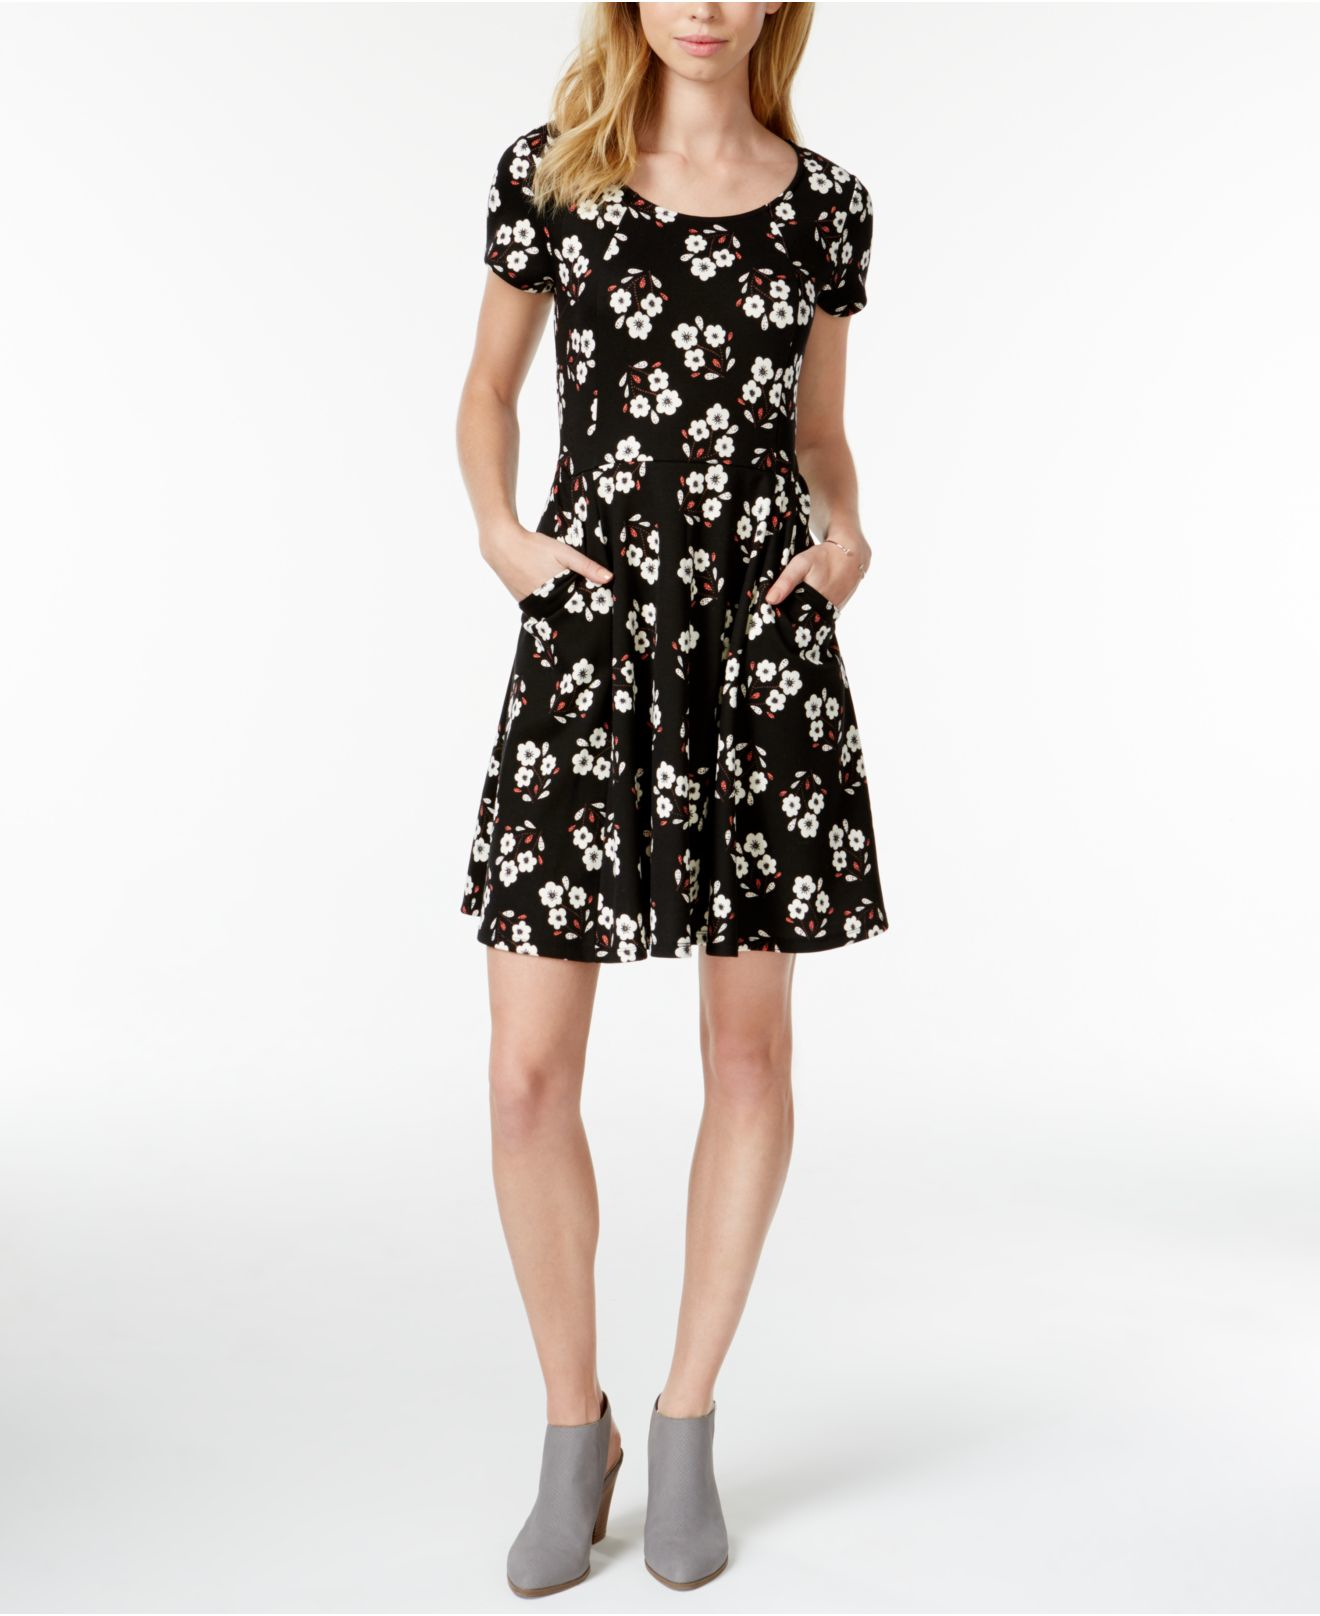 Macy S Black Dress Shoes